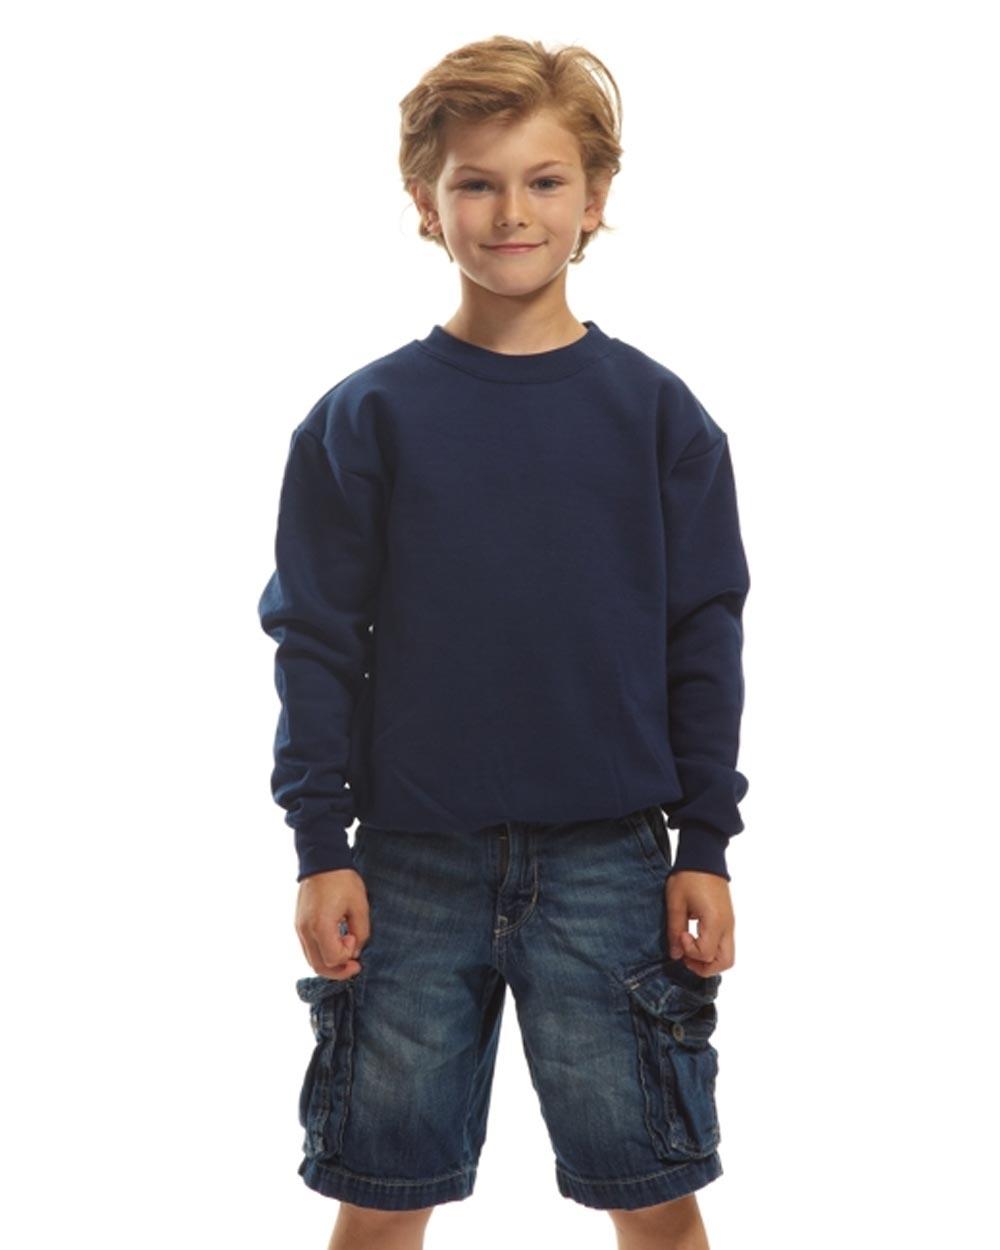 Jerico Youth Crewneck Sweatshirt